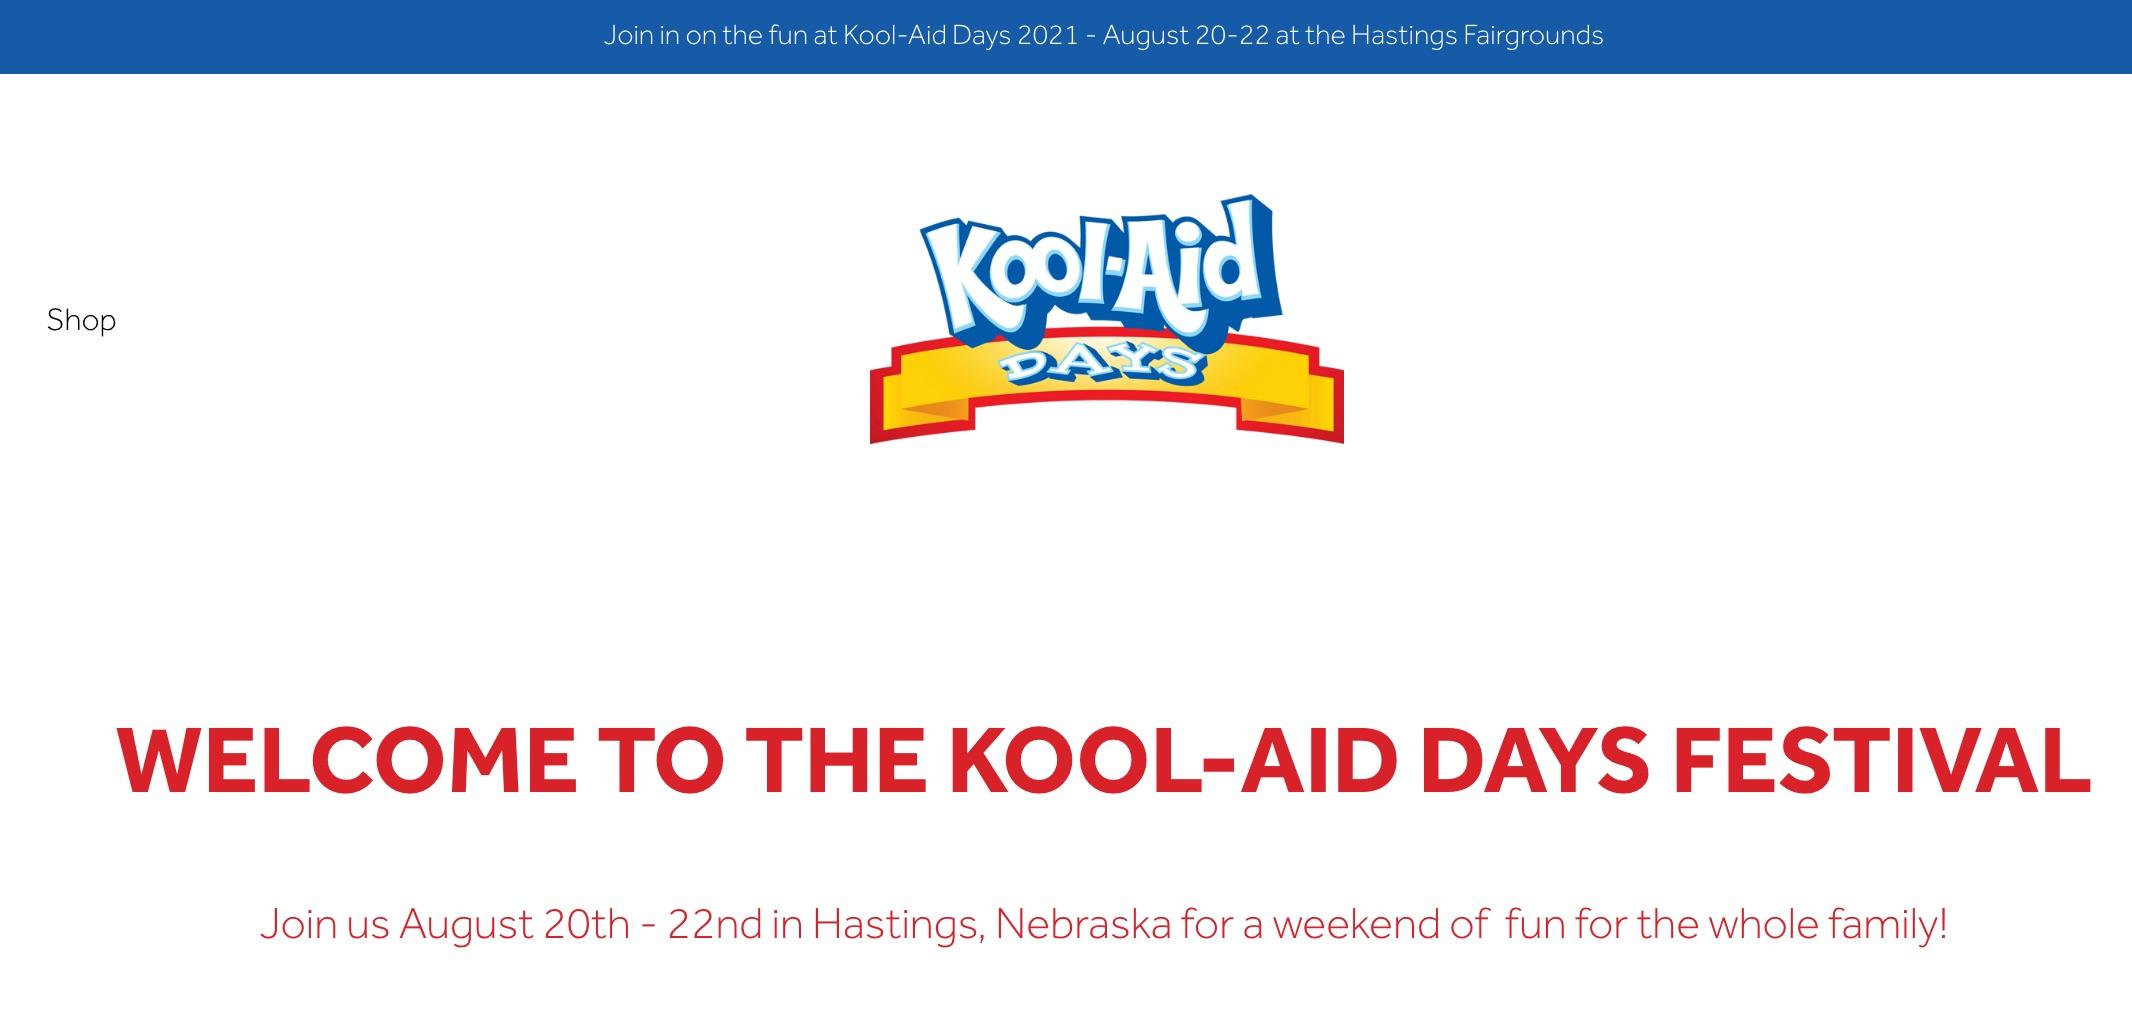 national kool aid day 2021